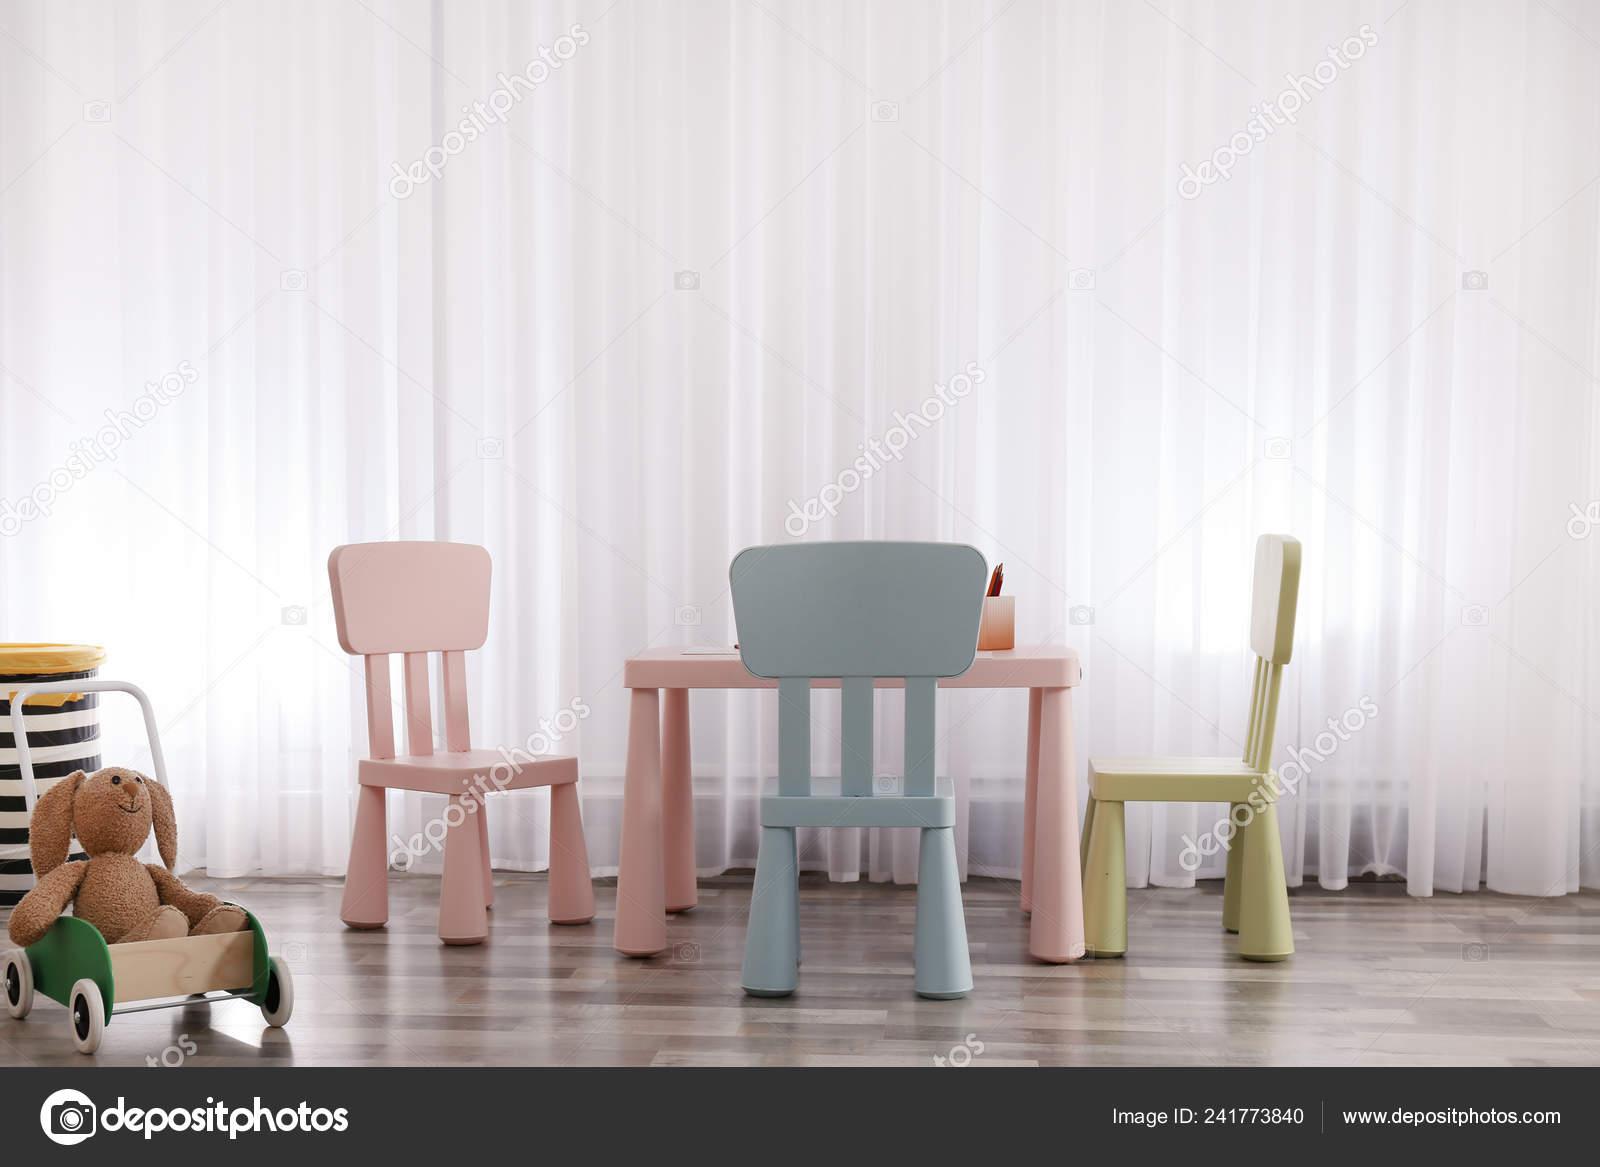 Picture of: Modern Child Room Interior Table Chairs Stock Photo C Liudmilachernetska Gmail Com 241773840